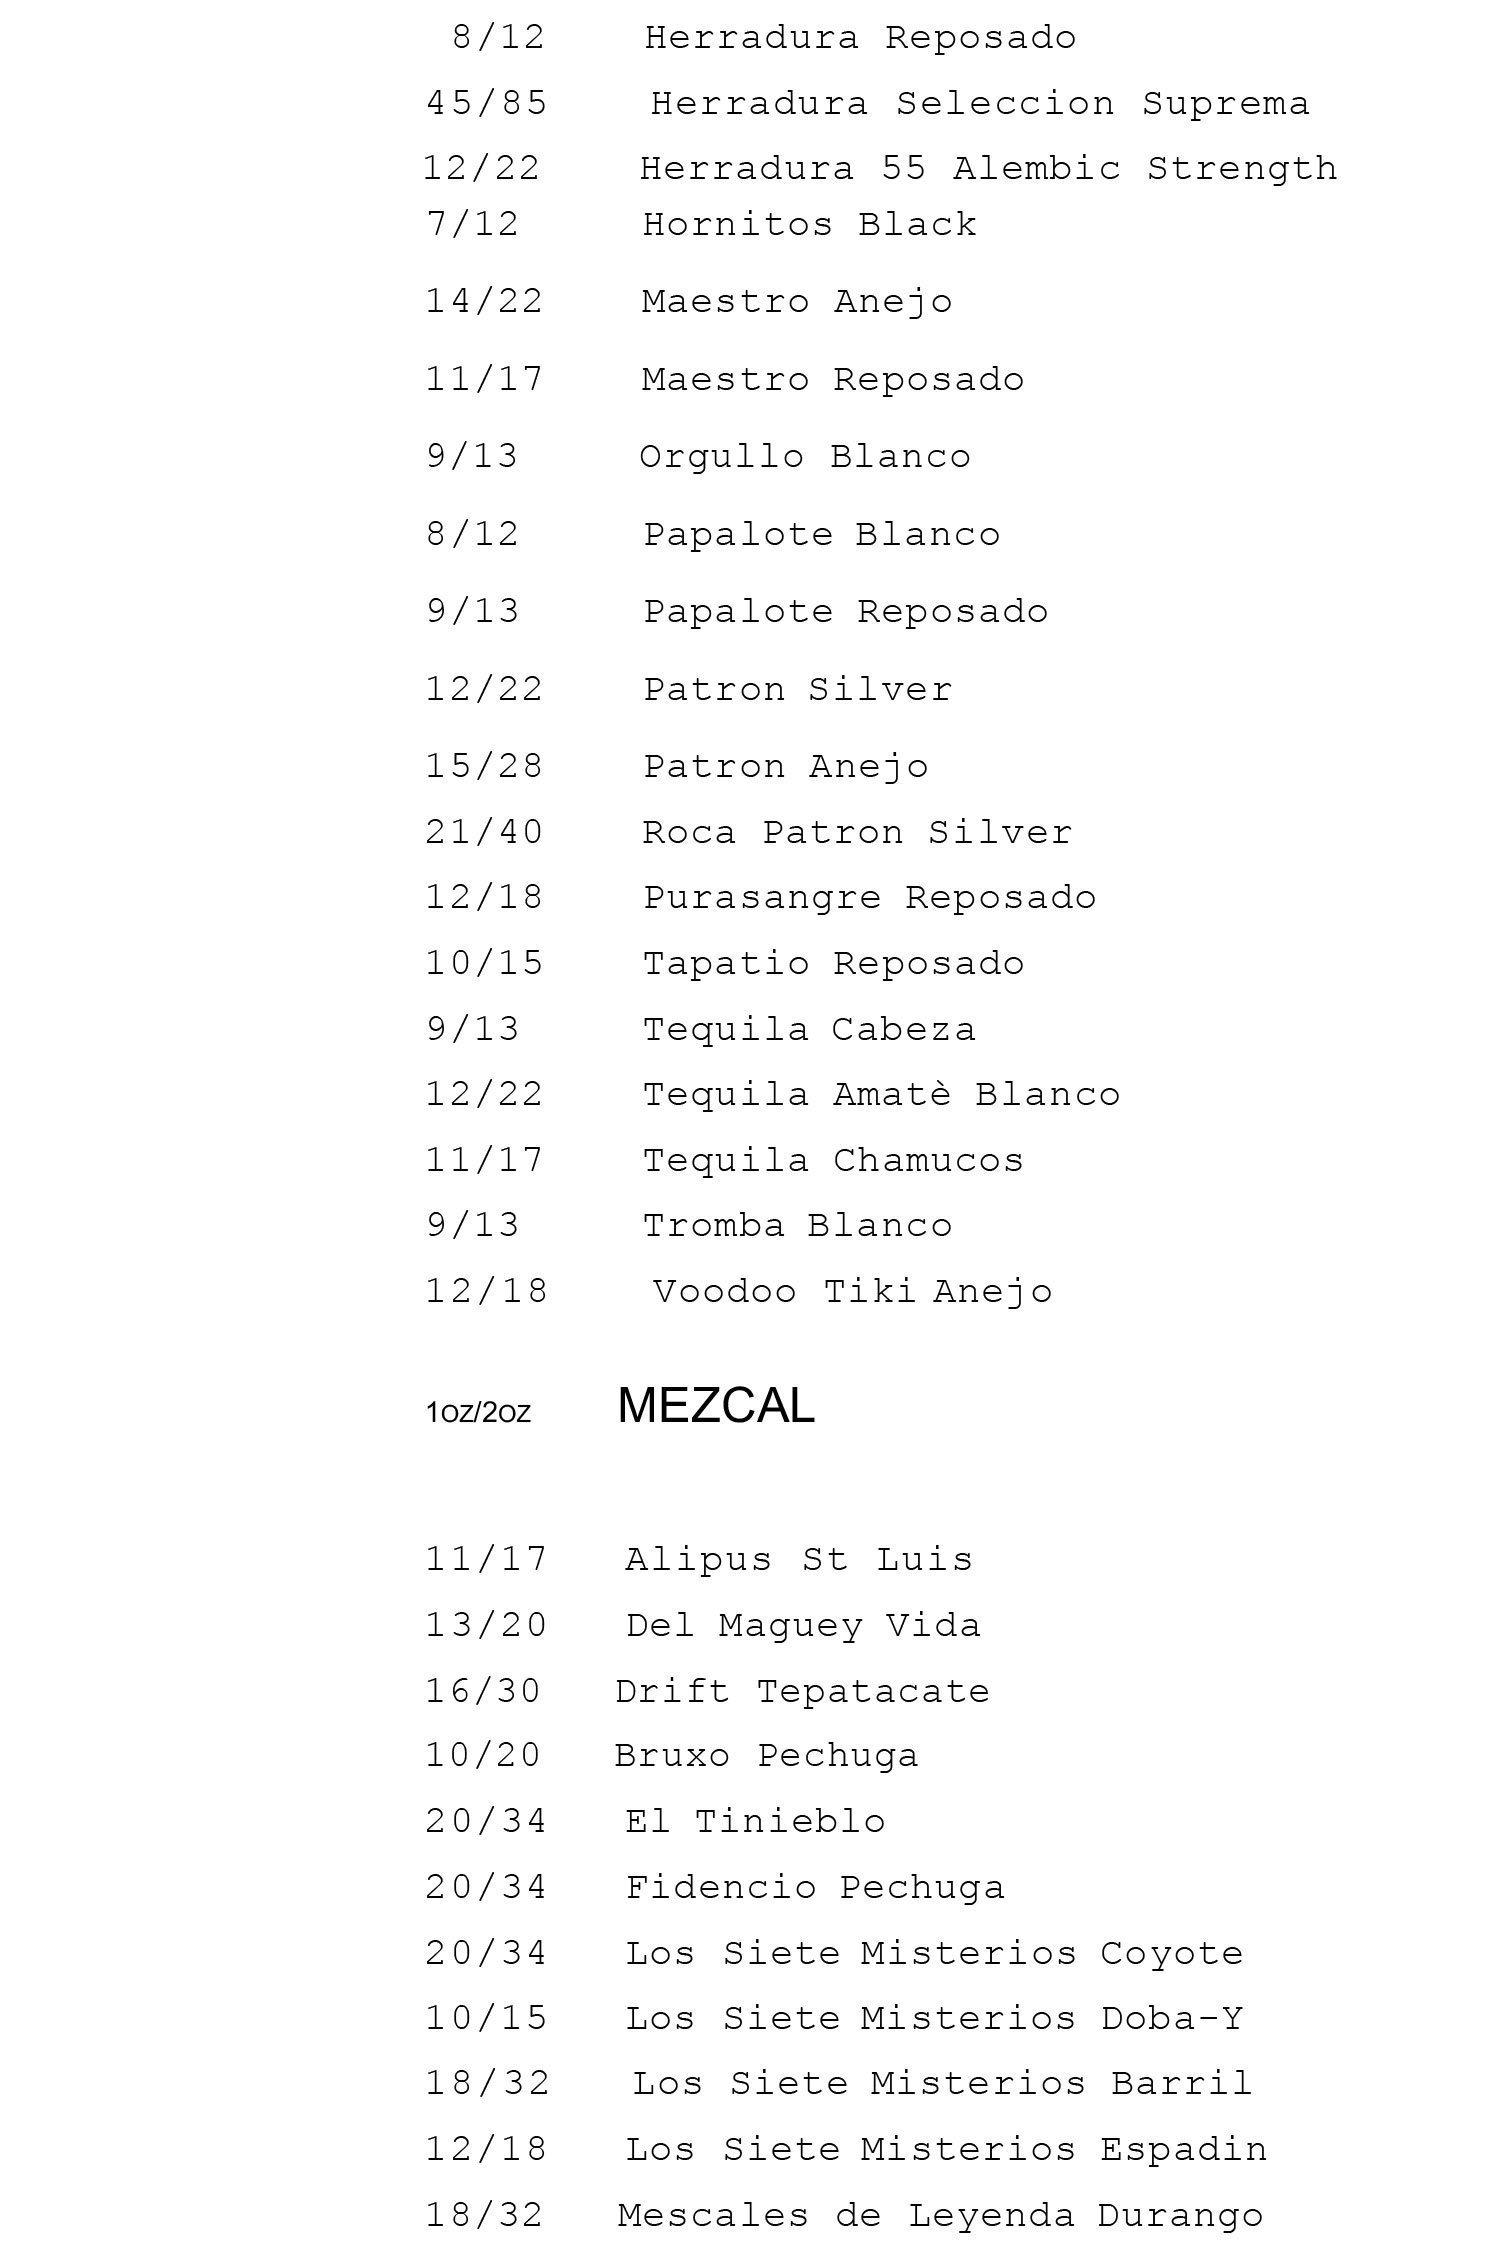 Mexcal list